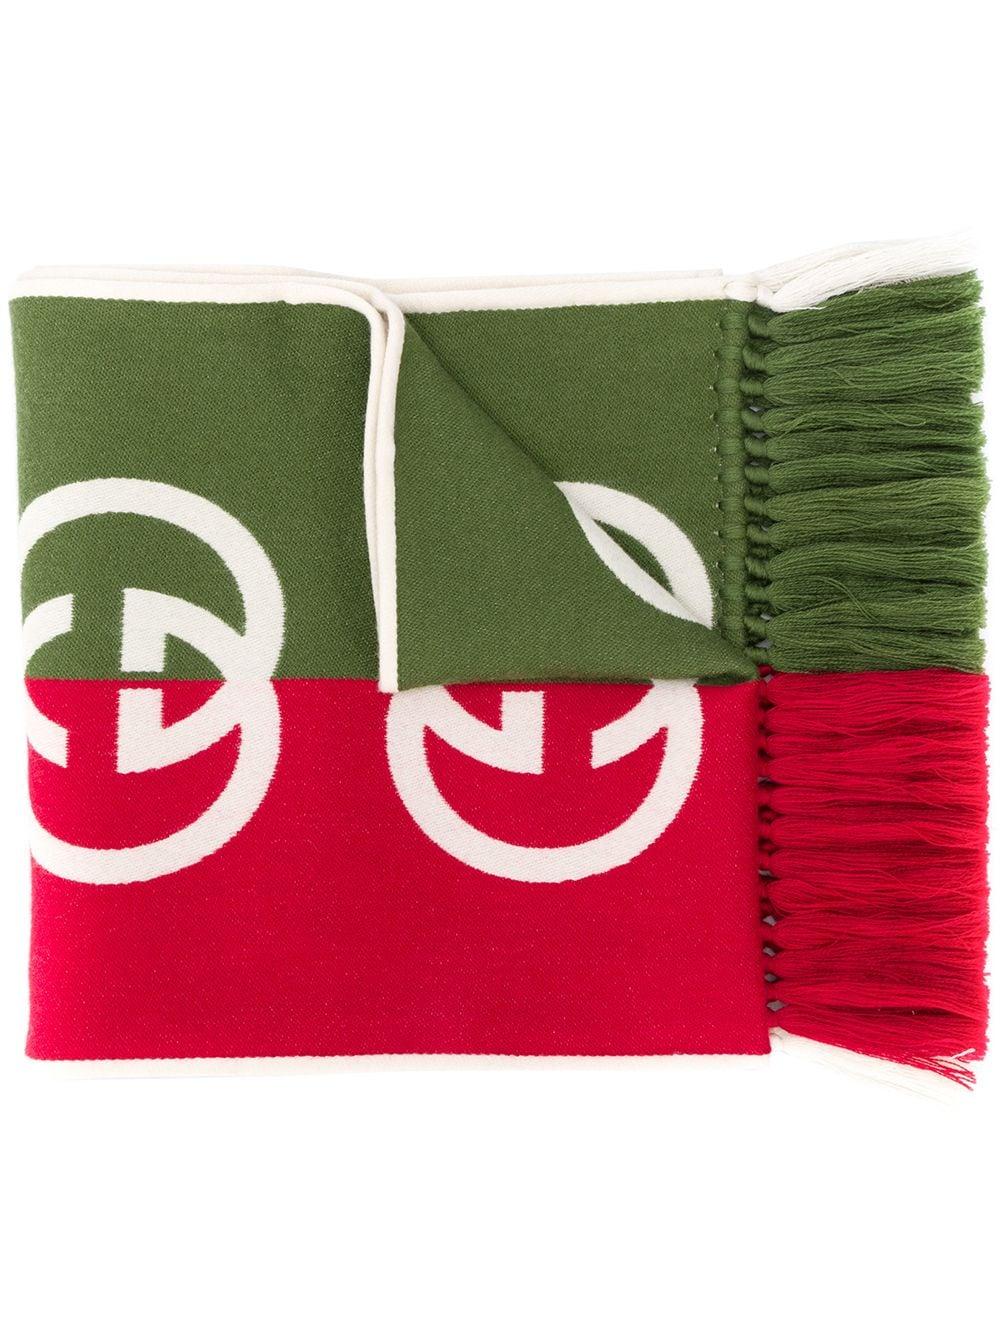 bicolor wool GG logo scarf GUCCI      575606-4G1843174